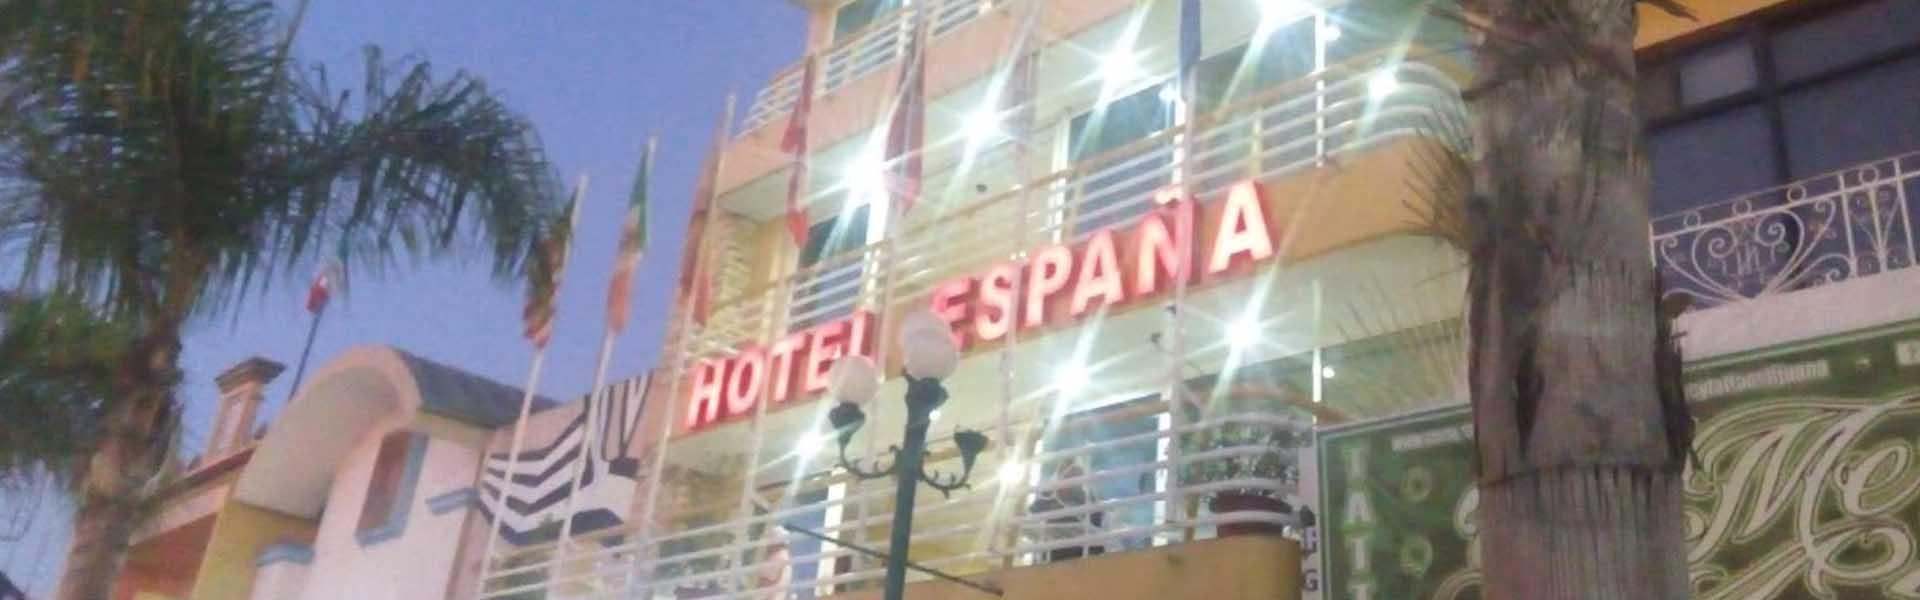 hotel-del-espana-tijuana